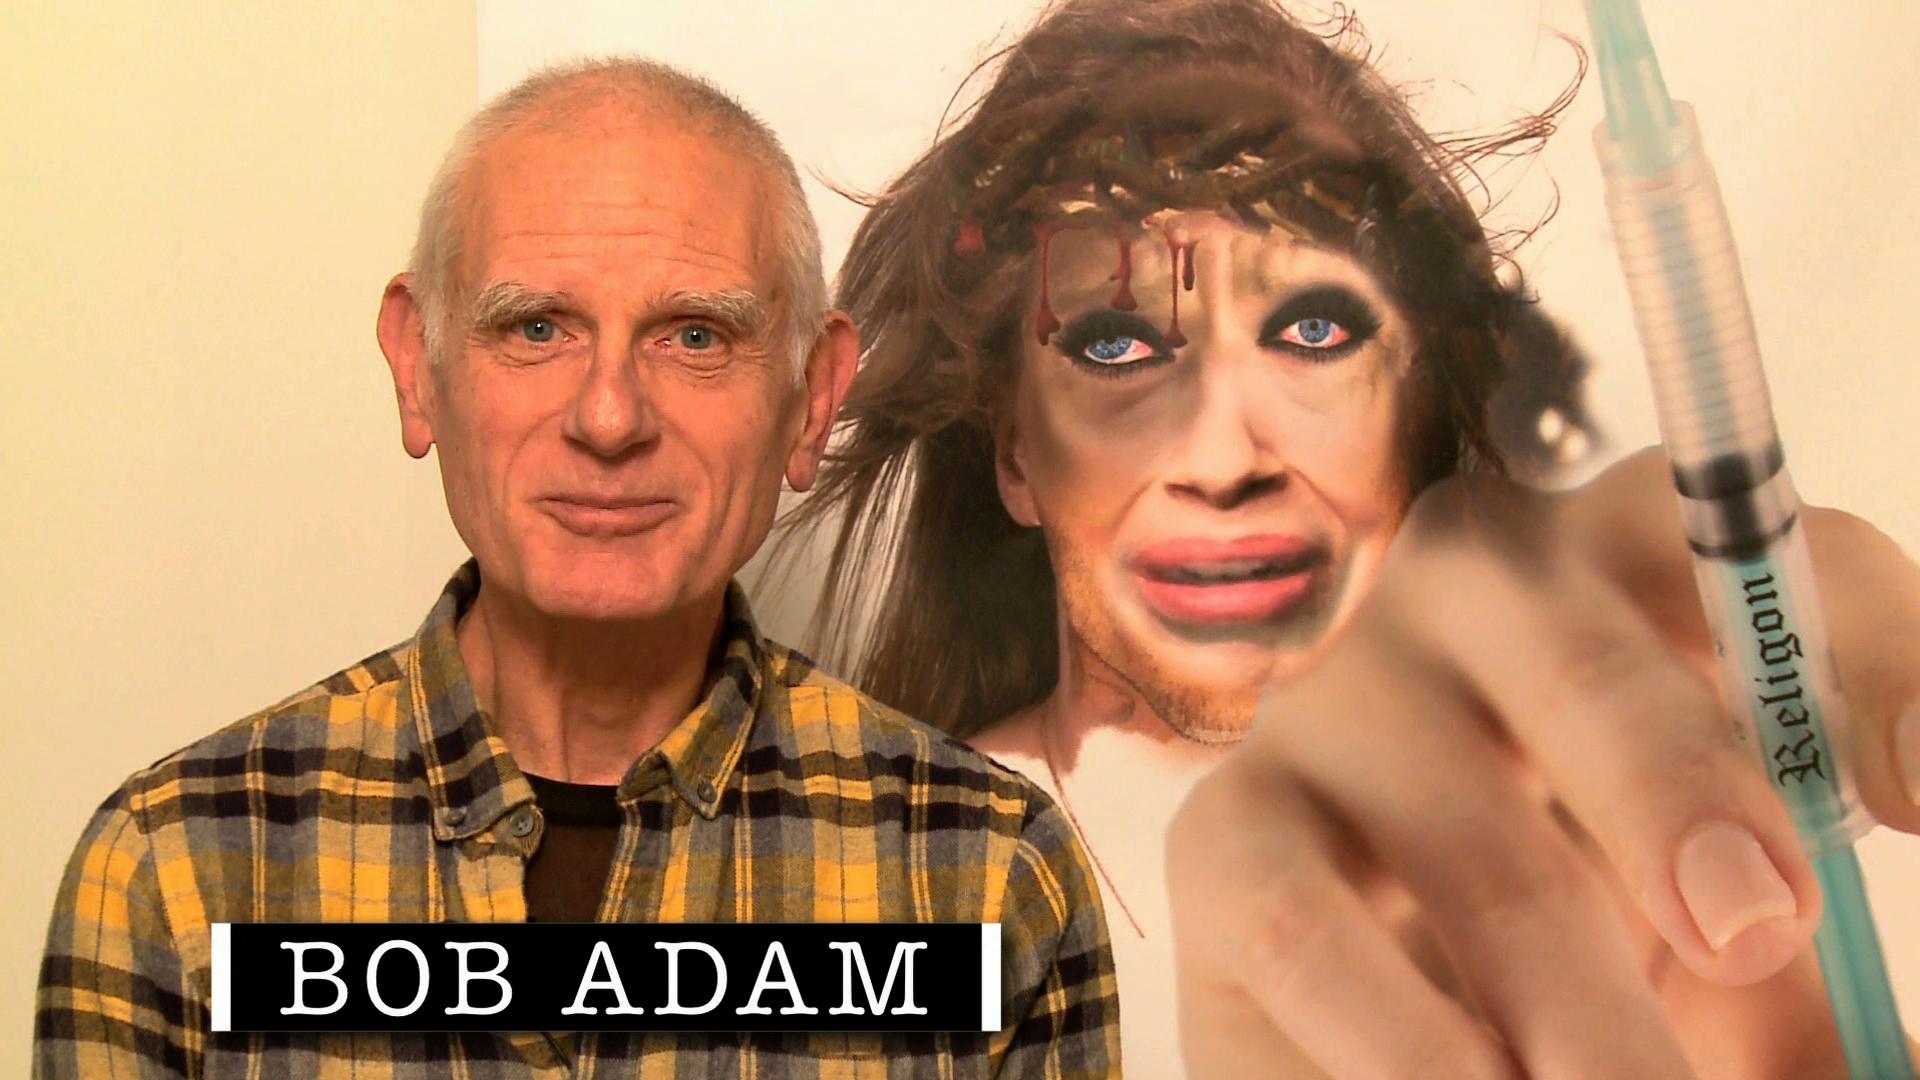 Bob Adam